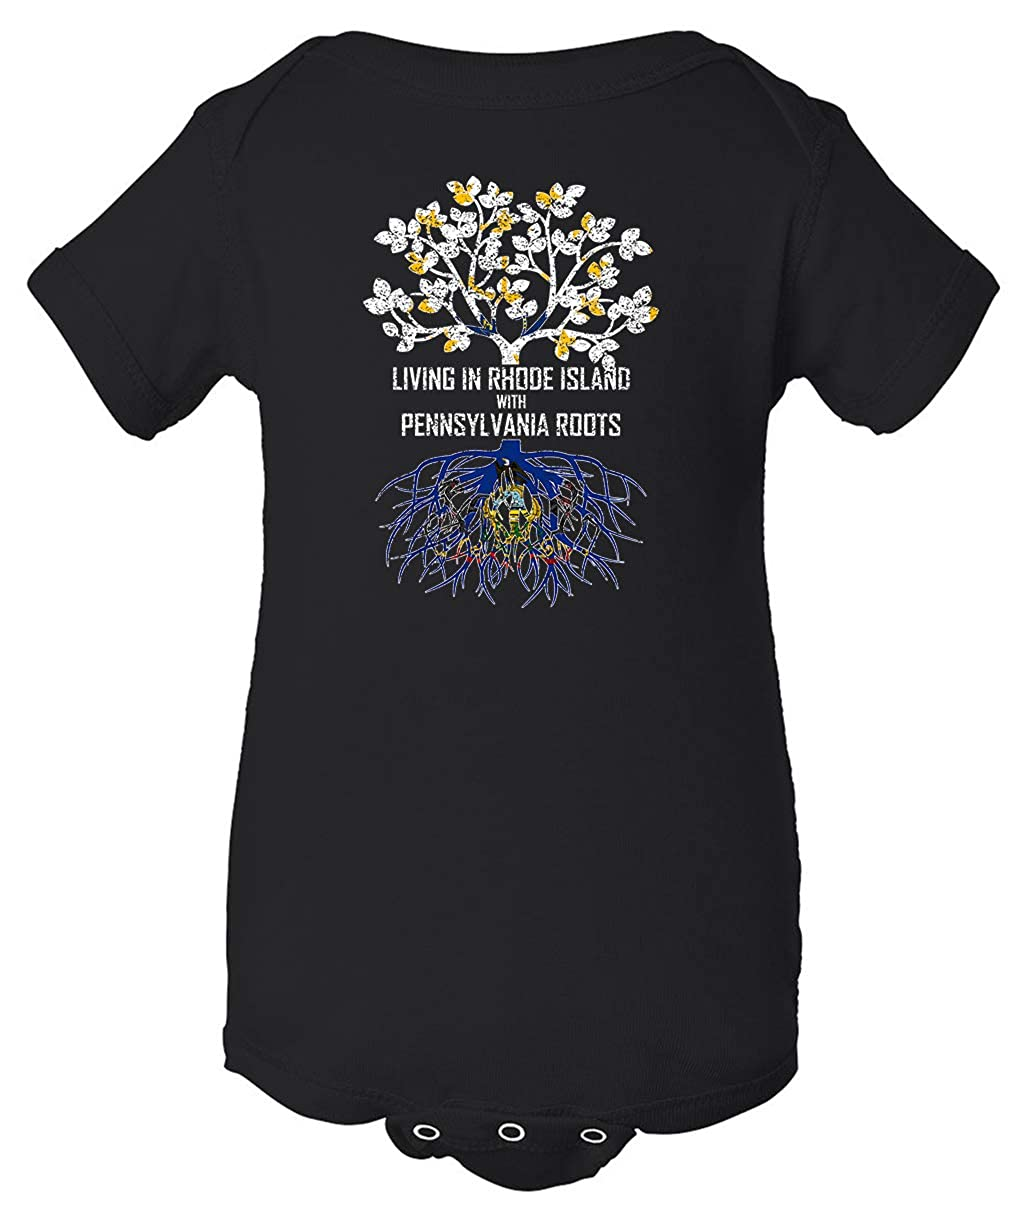 Tenacitee Babys Living in Rhode Island Pennsylvania Roots Shirt